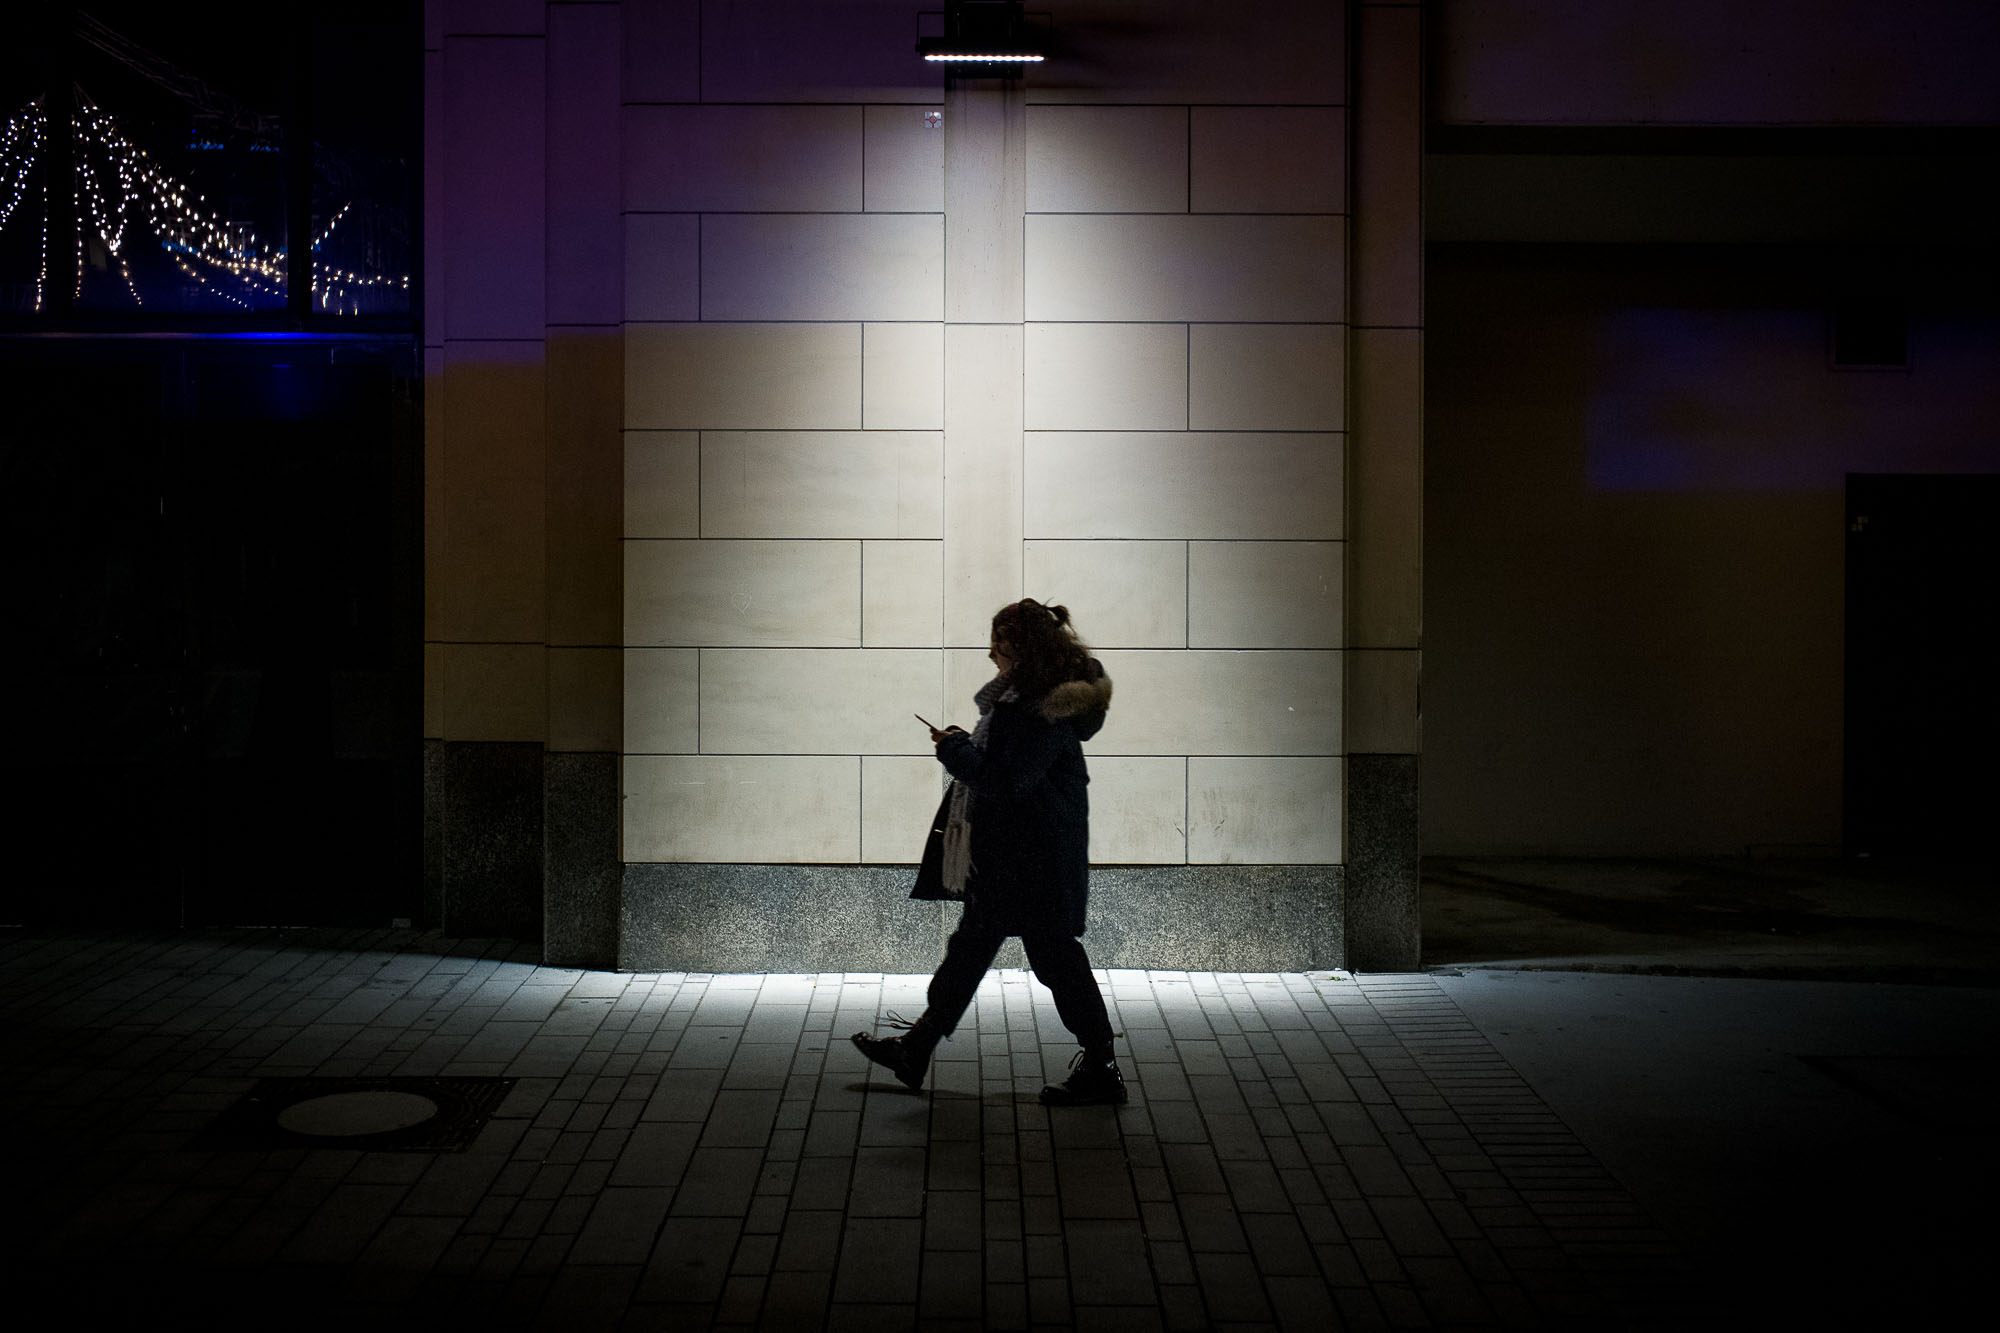 Woman walking through a cone of light